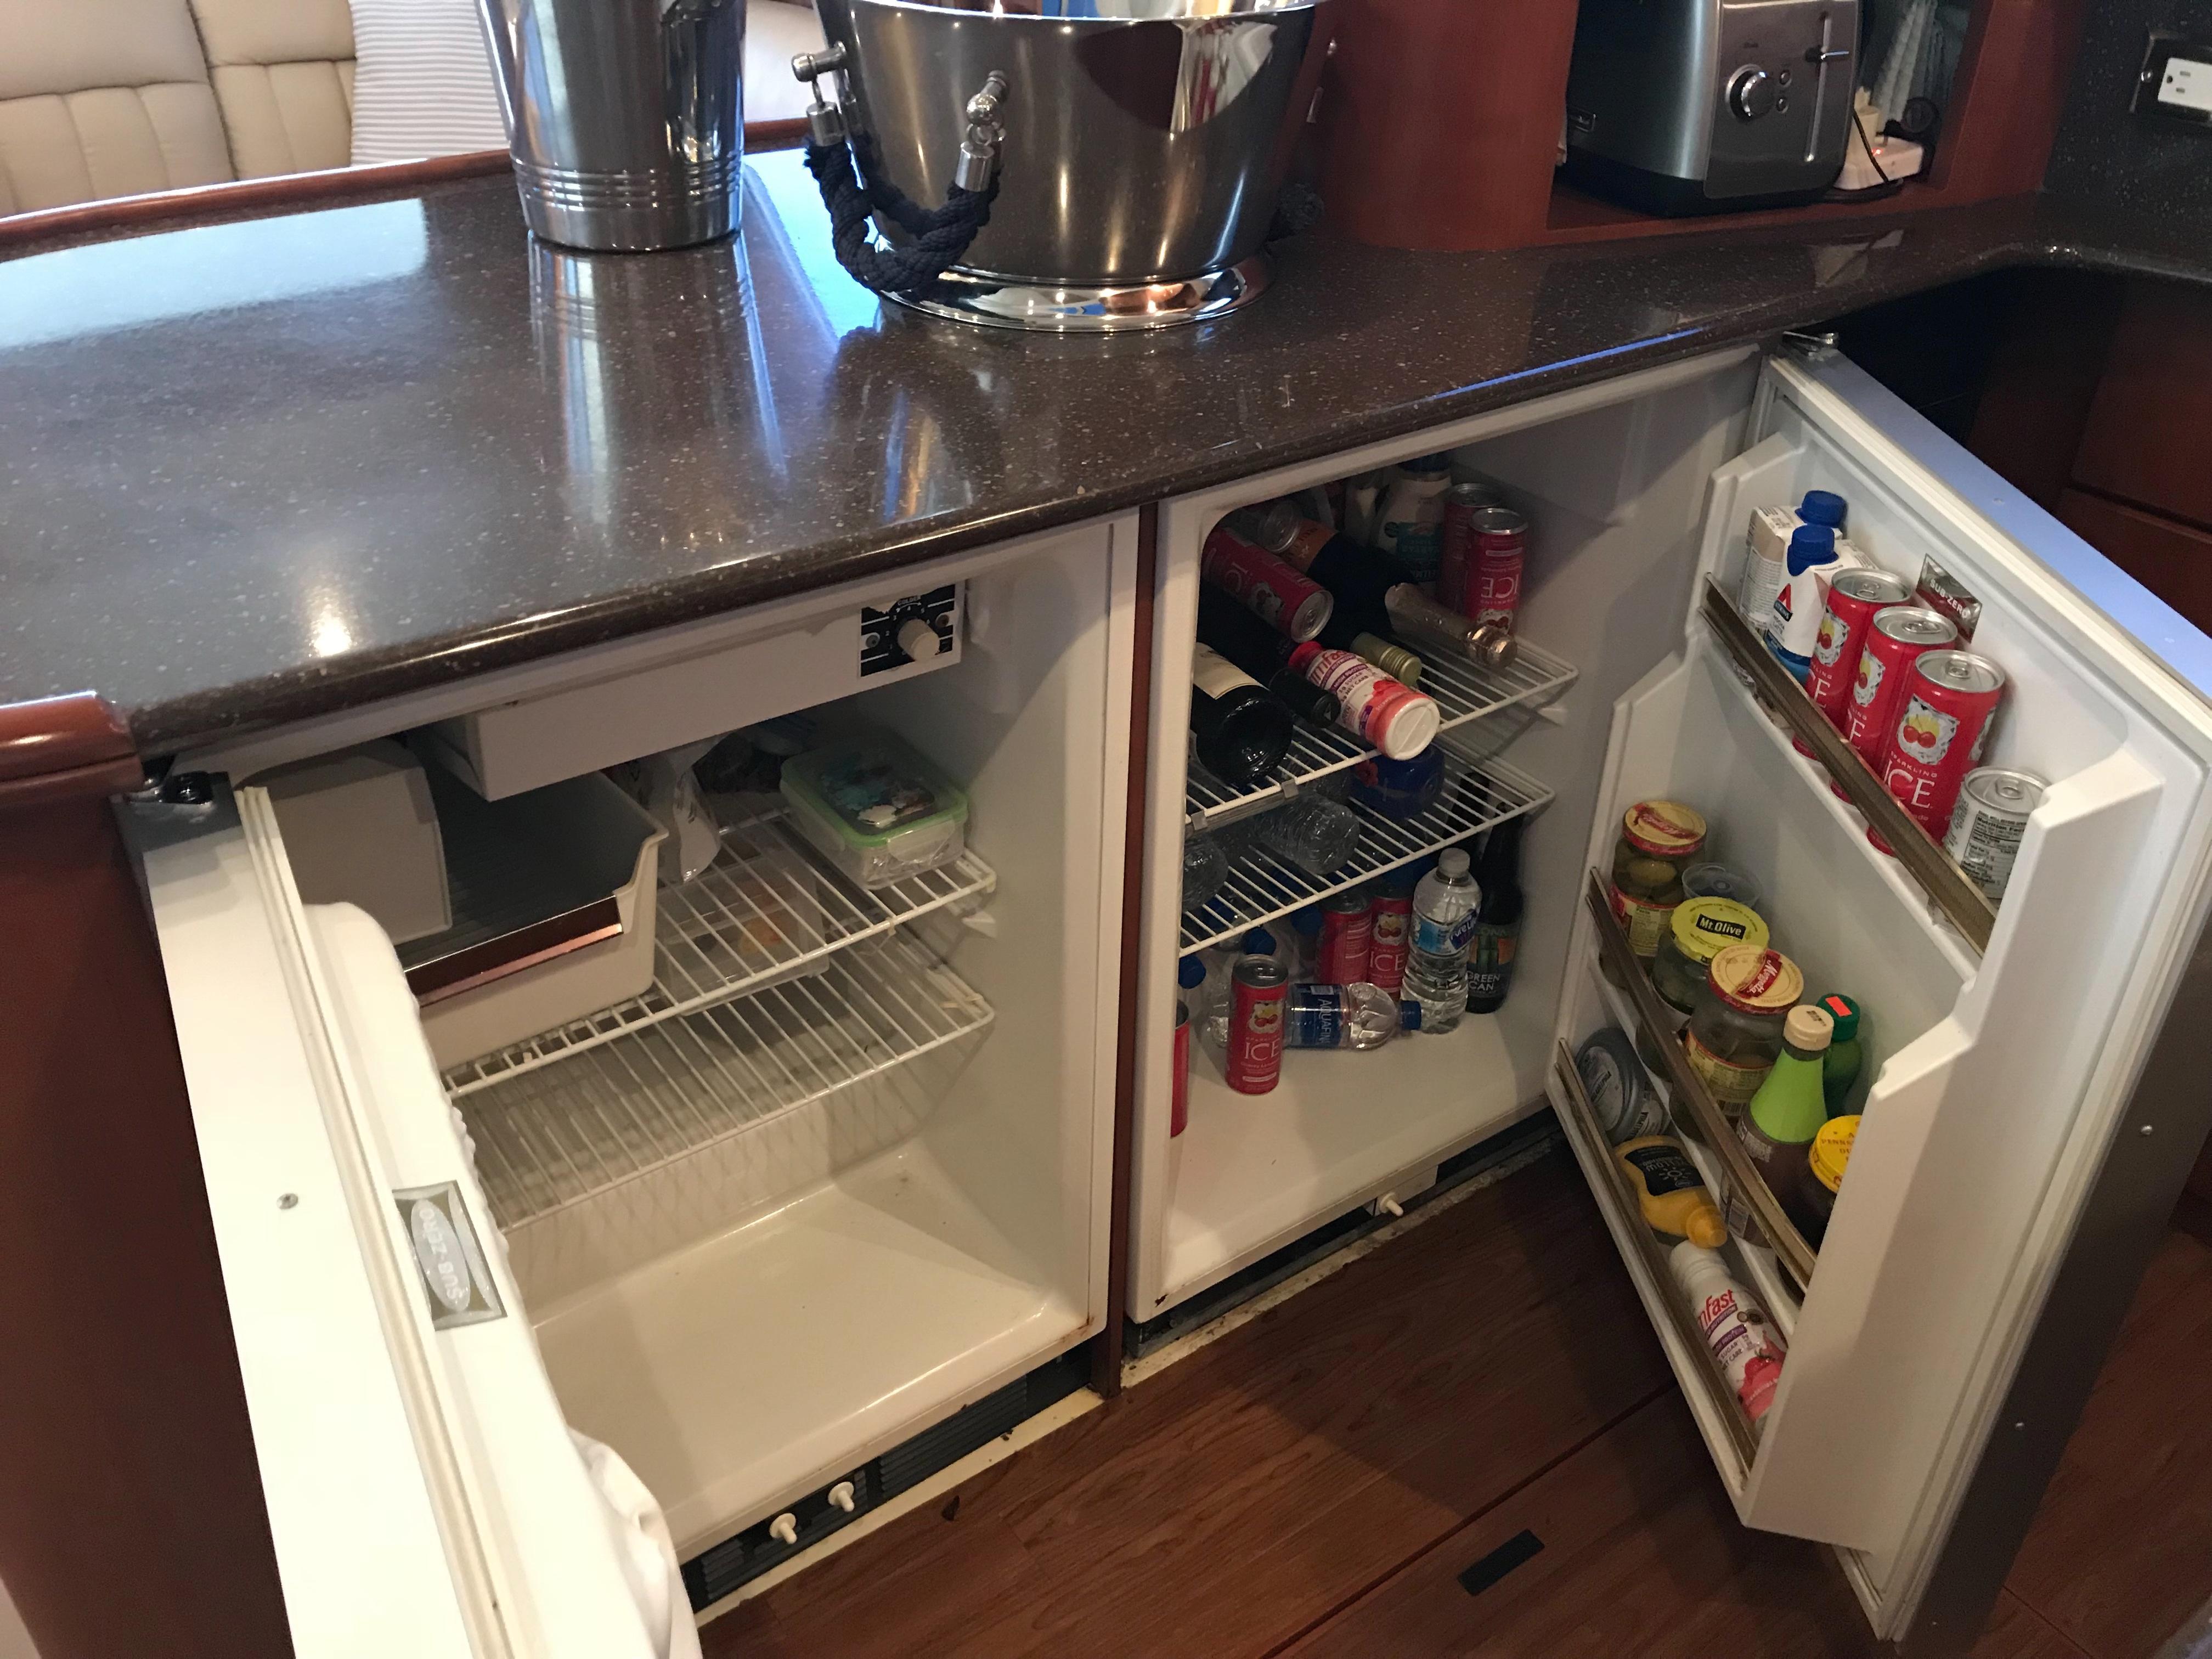 Silverton 48 Convertible - Subzero Refrigerator and Freezer